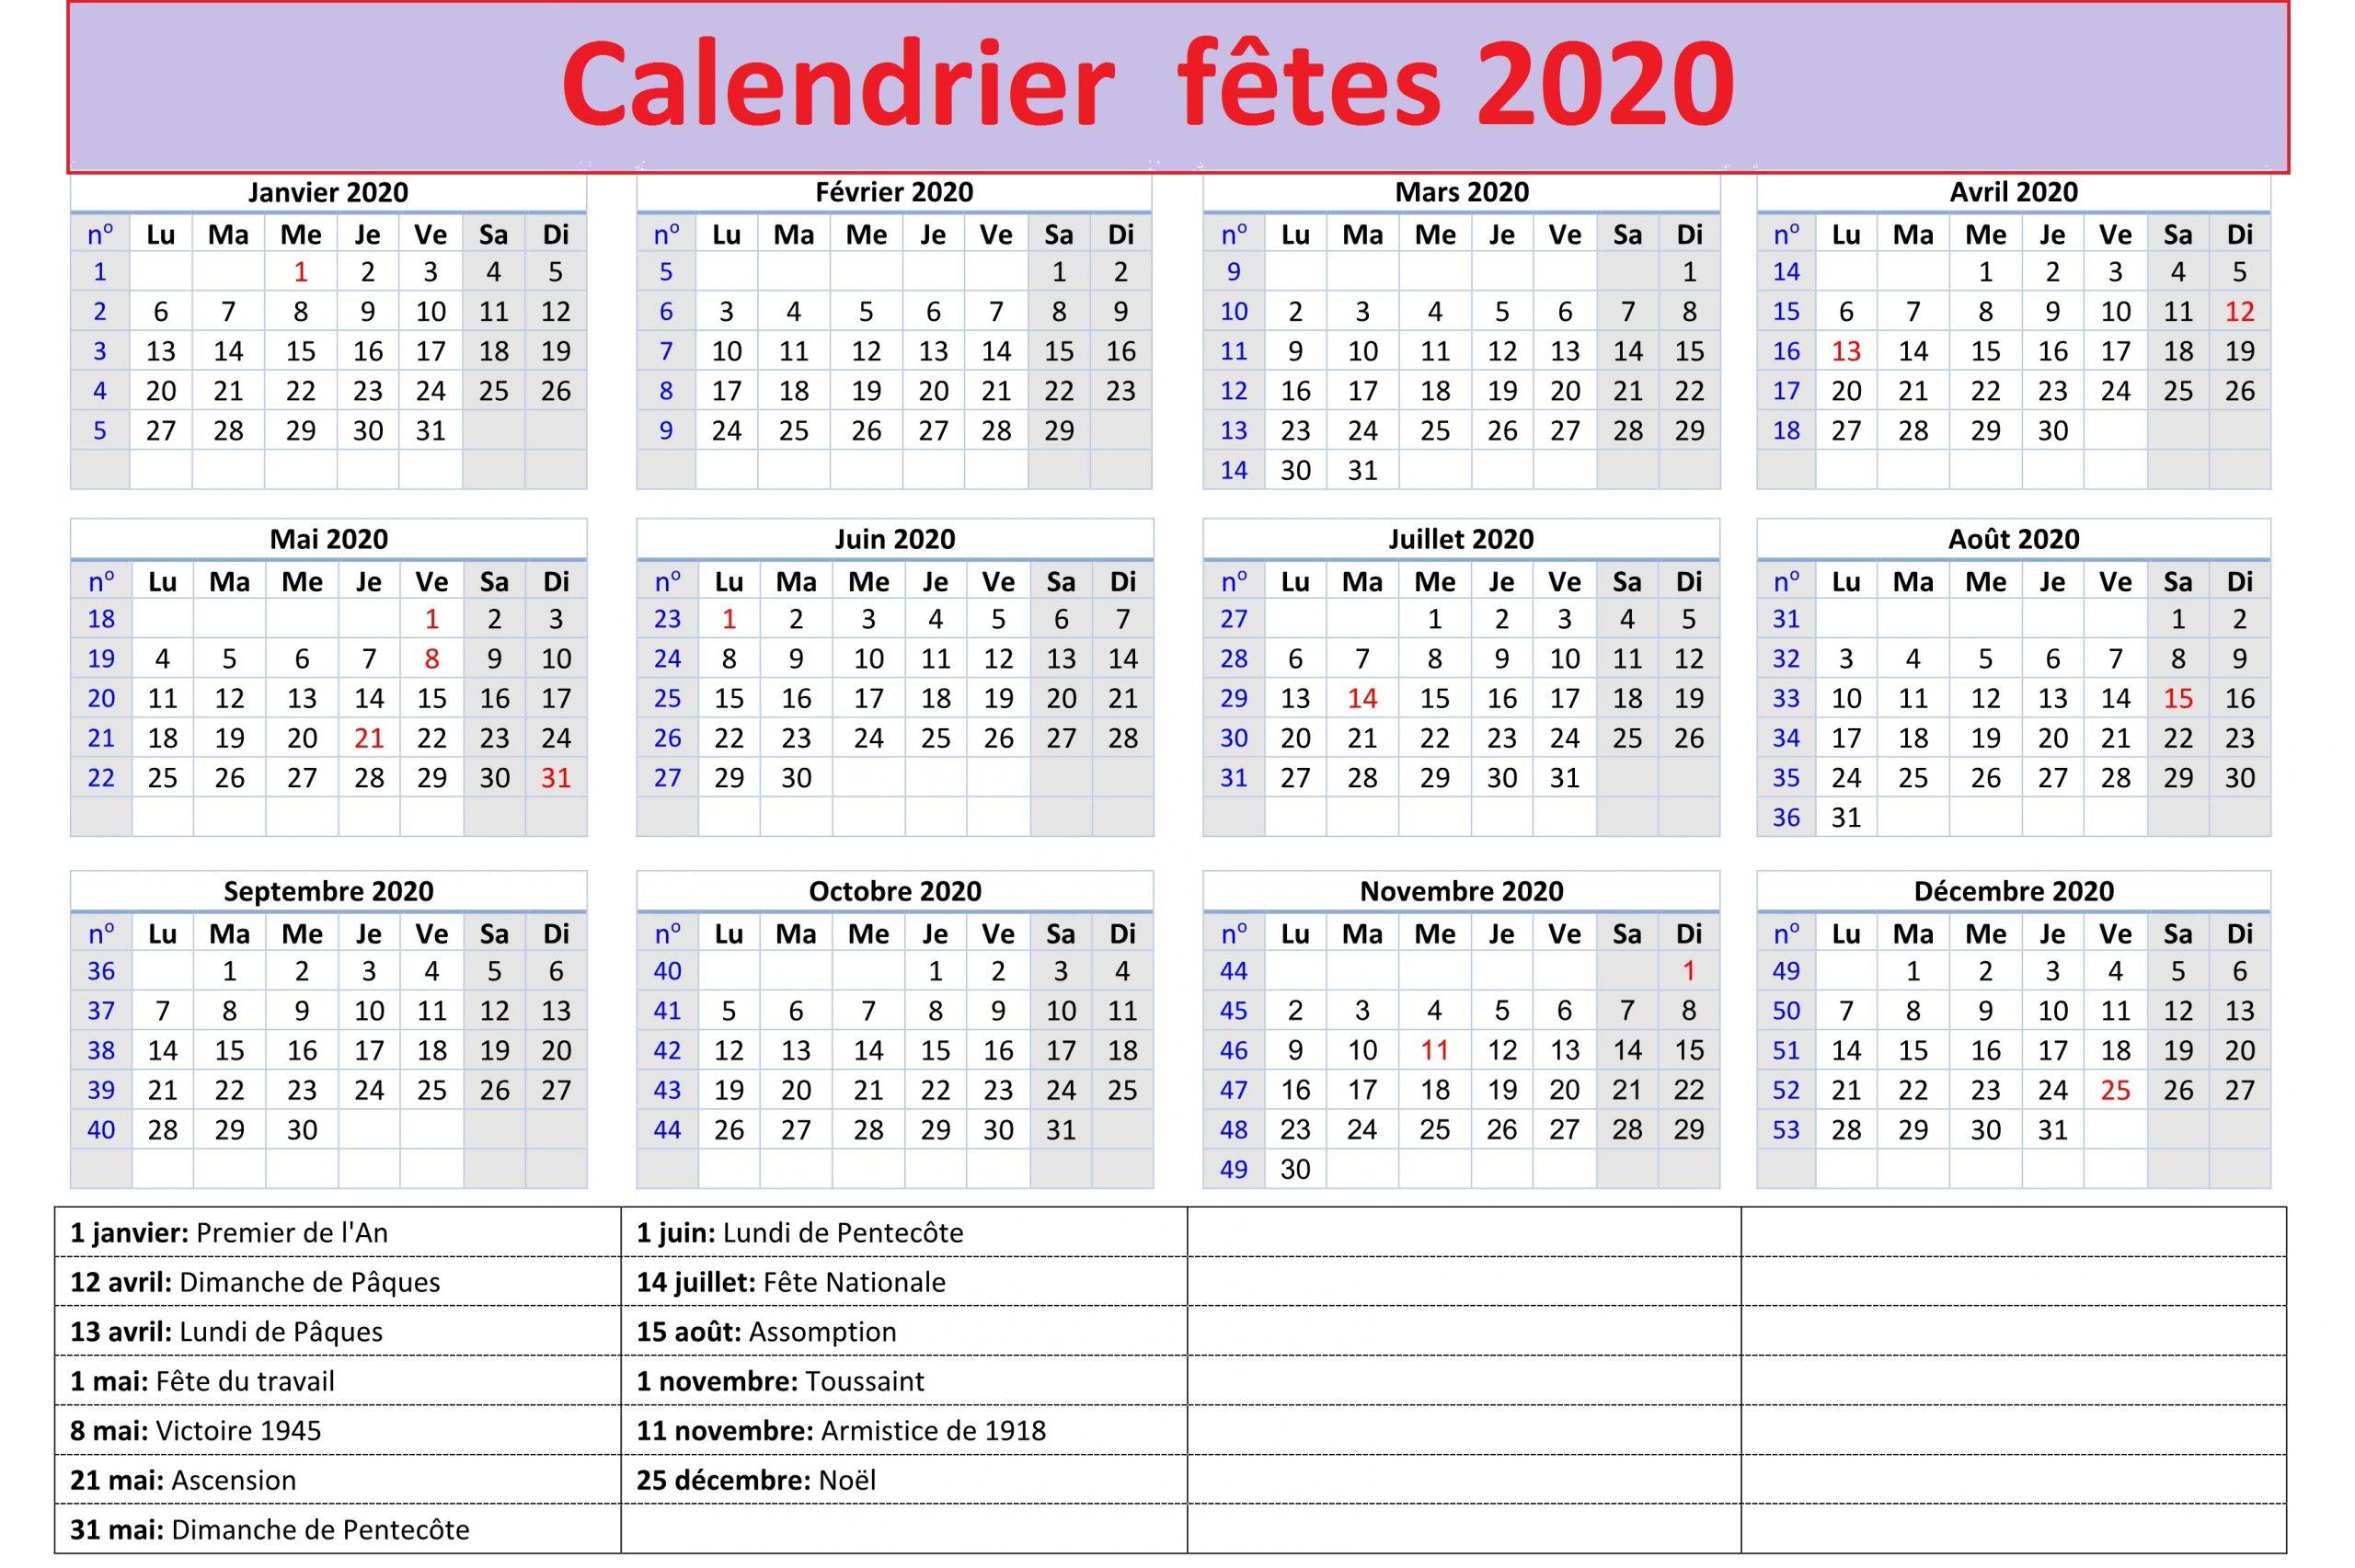 Calendrier Des Fetes 2020 Prenom